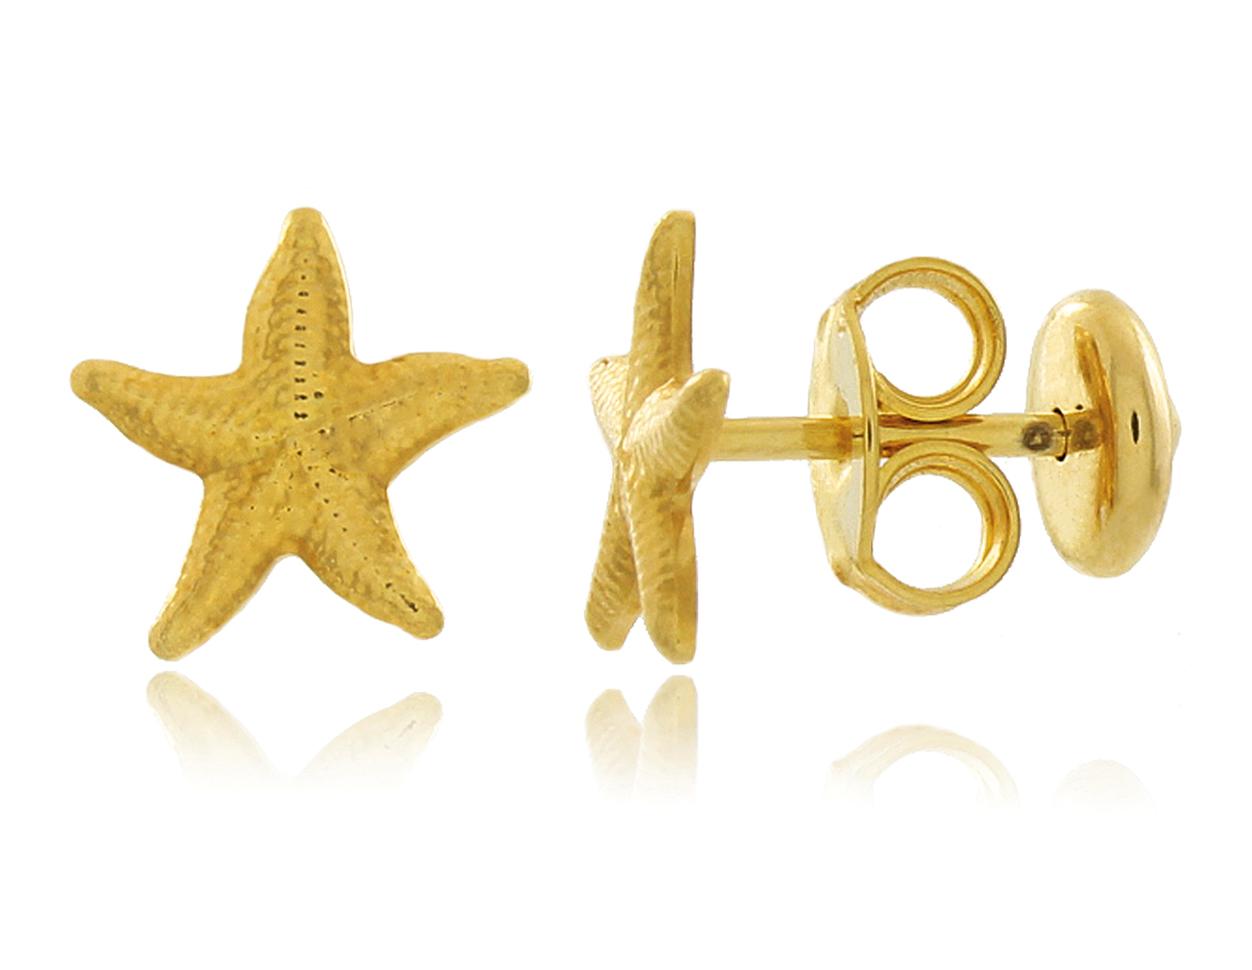 Brinco Infantil Estrela do Mar Dourado Duquesa Semi joia